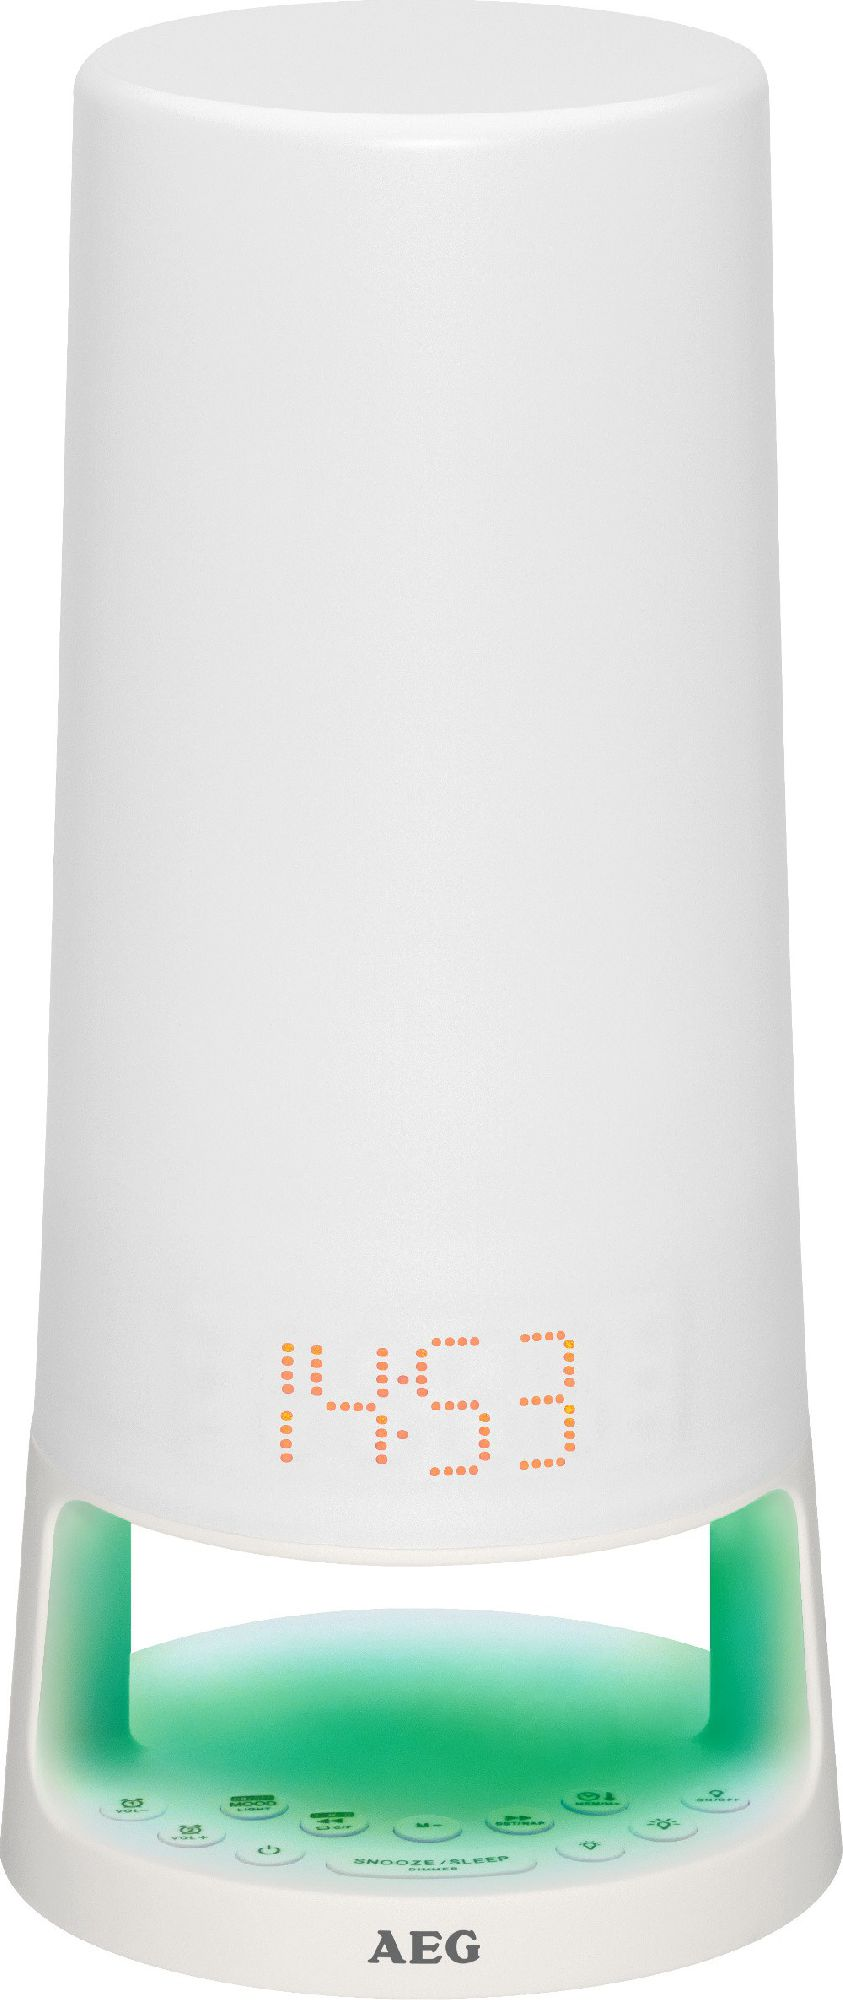 AEG MRC 4147 (white color) radio, radiopulksteņi